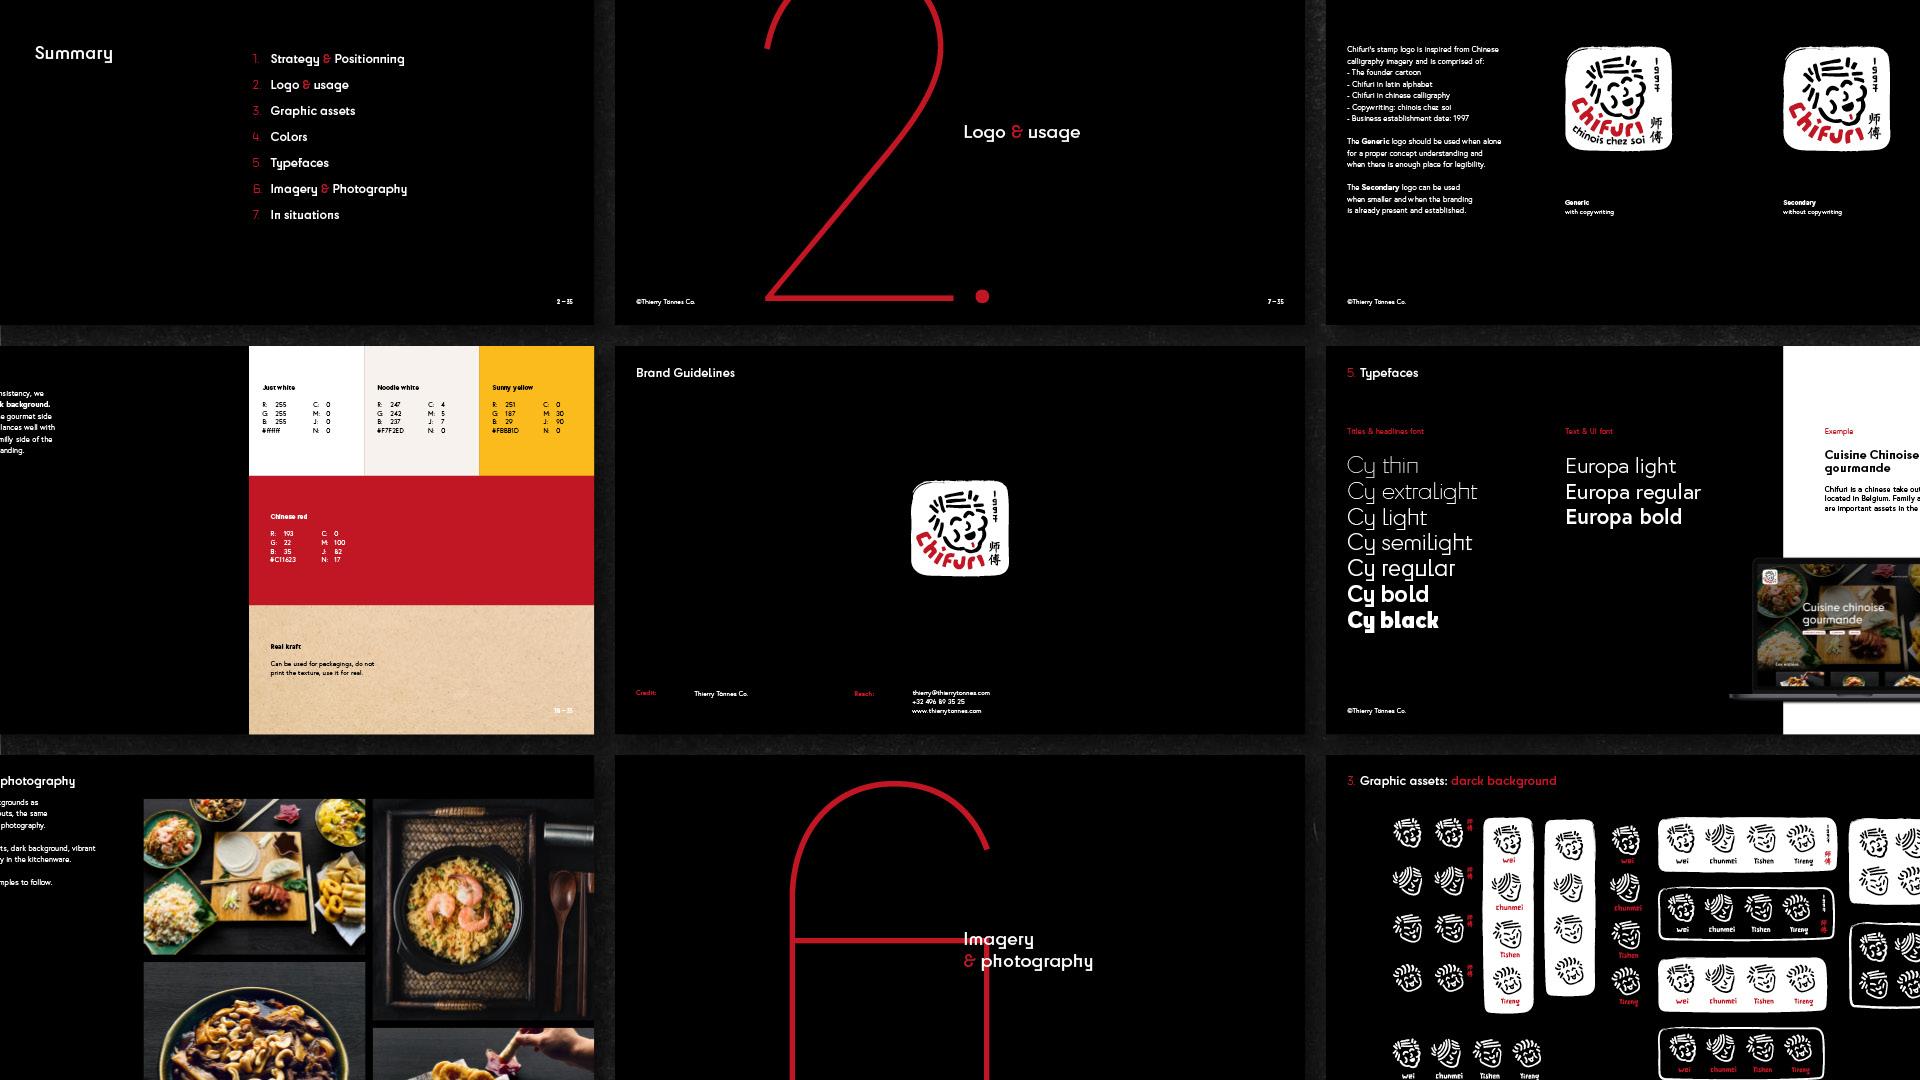 CHIFURI-graphic-guidelines-1